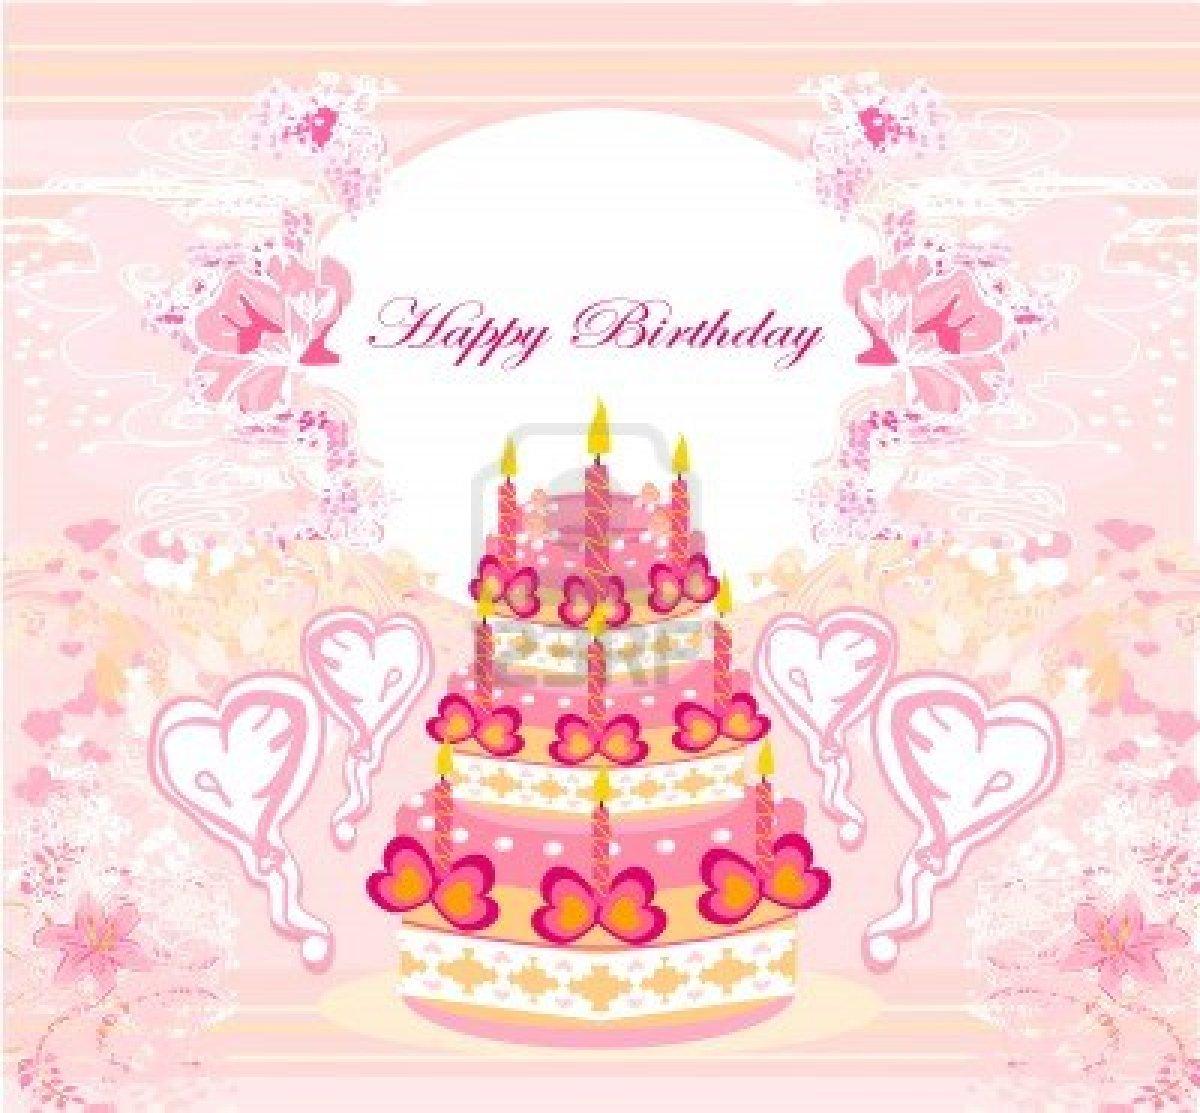 happy birthday card for - photo #7